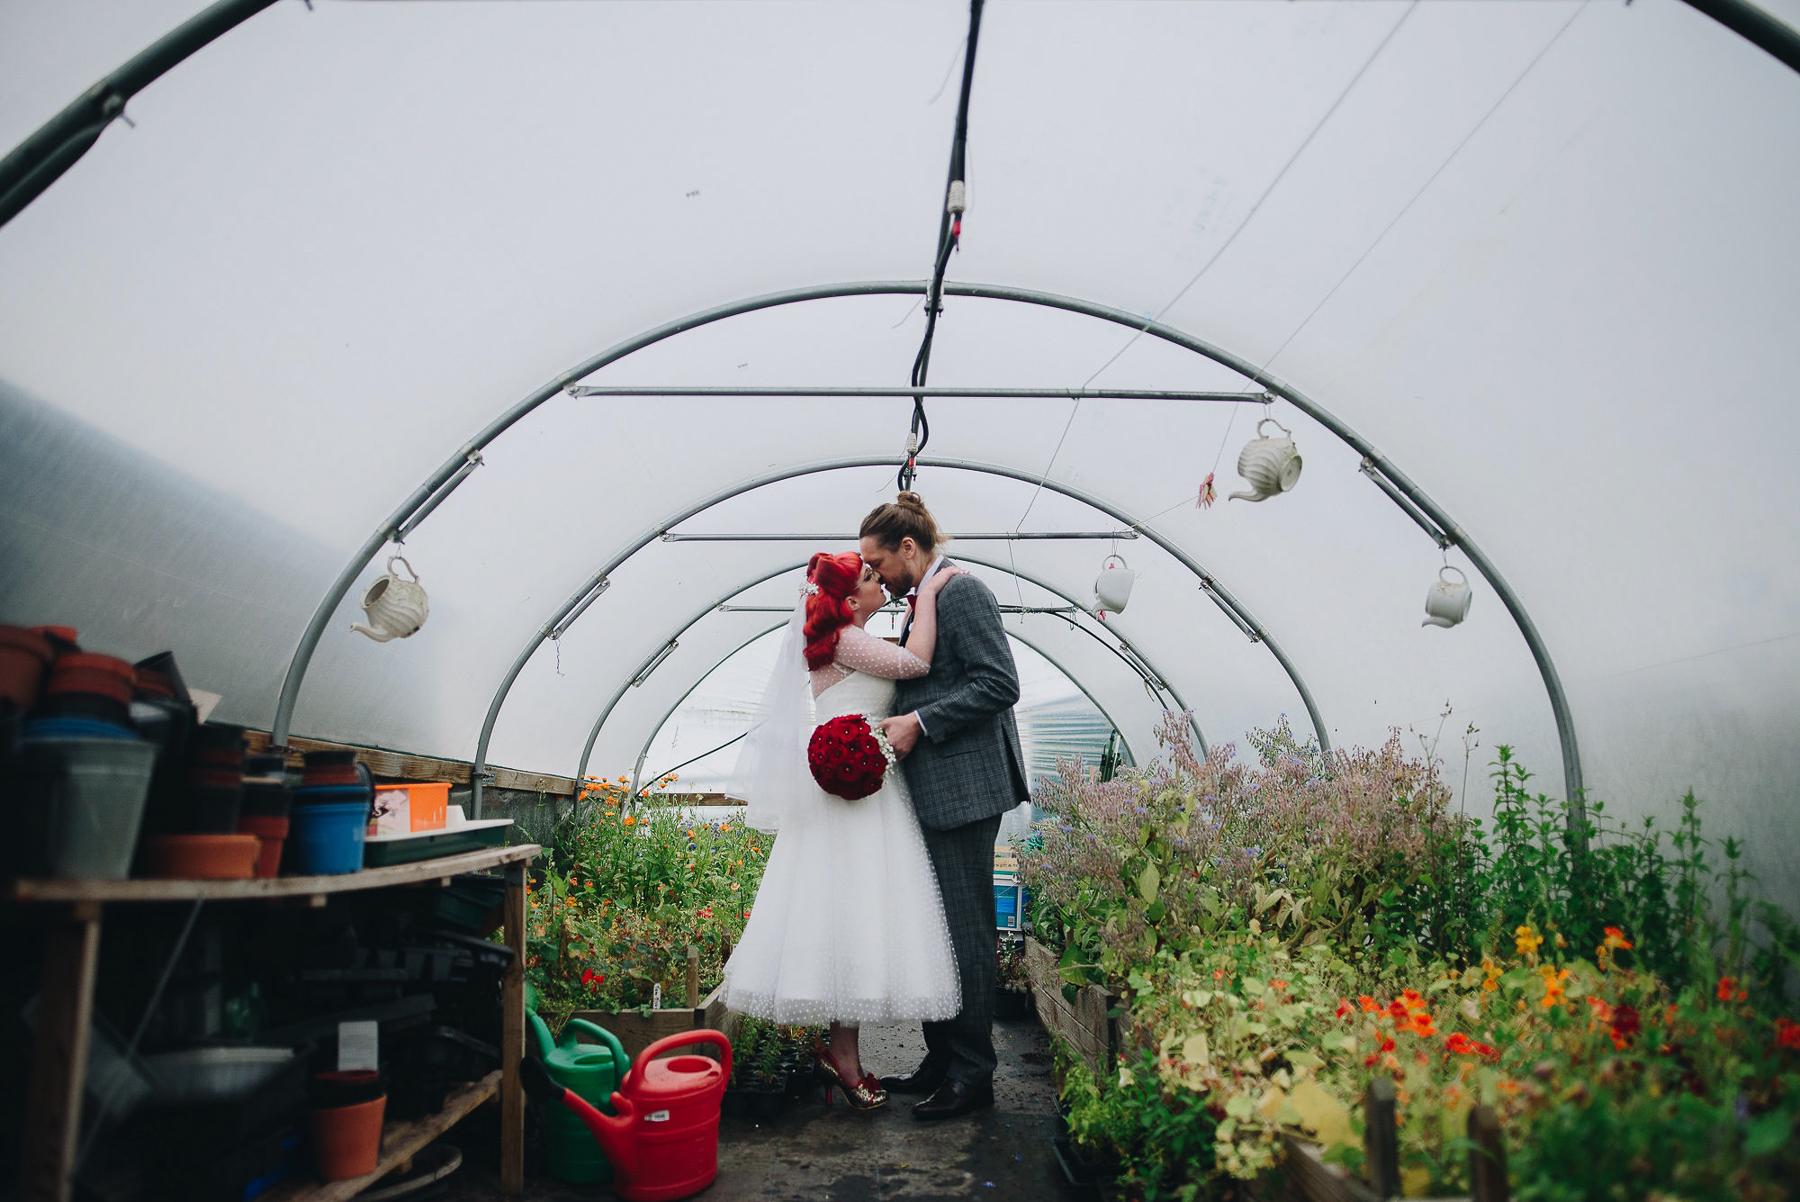 Wellbeing_Farm_Wedding_Photography_The_Pin-Up_Bride_Lara_Shaun-100.jpg